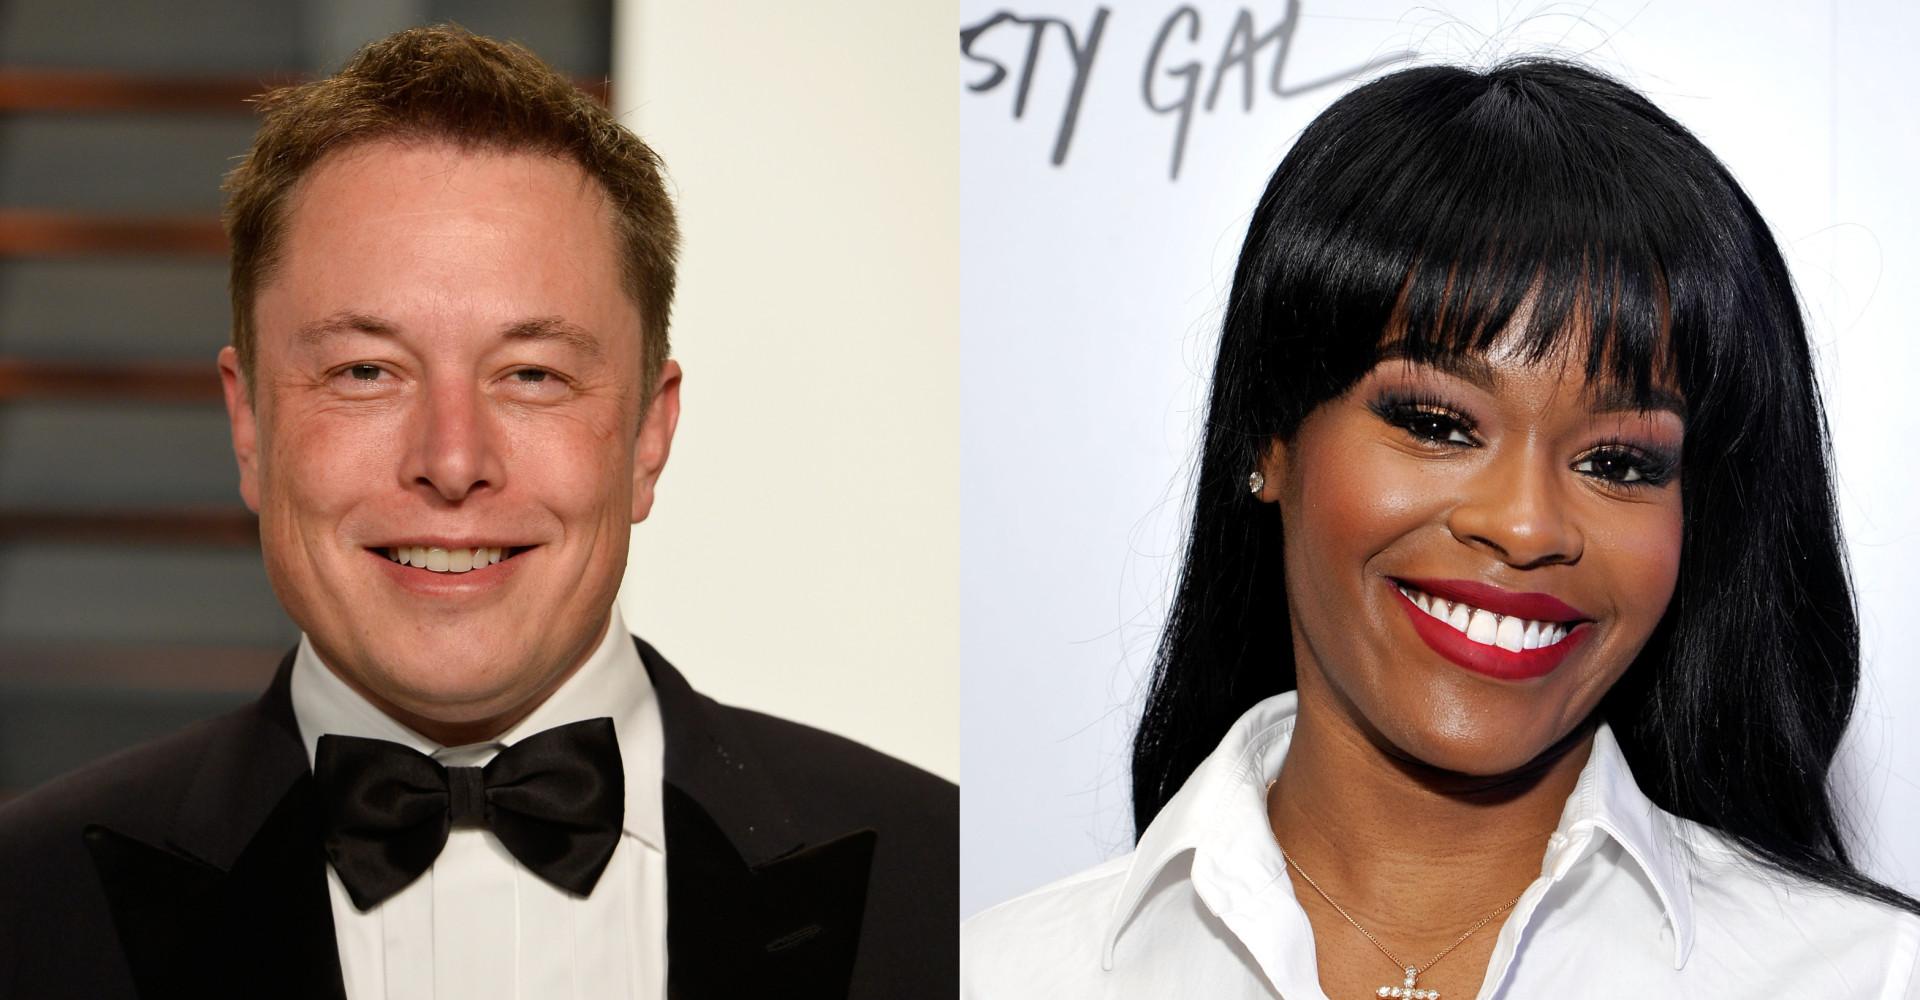 Elon Musk vs Azealia Banks: Inside the strangest celebrity feud